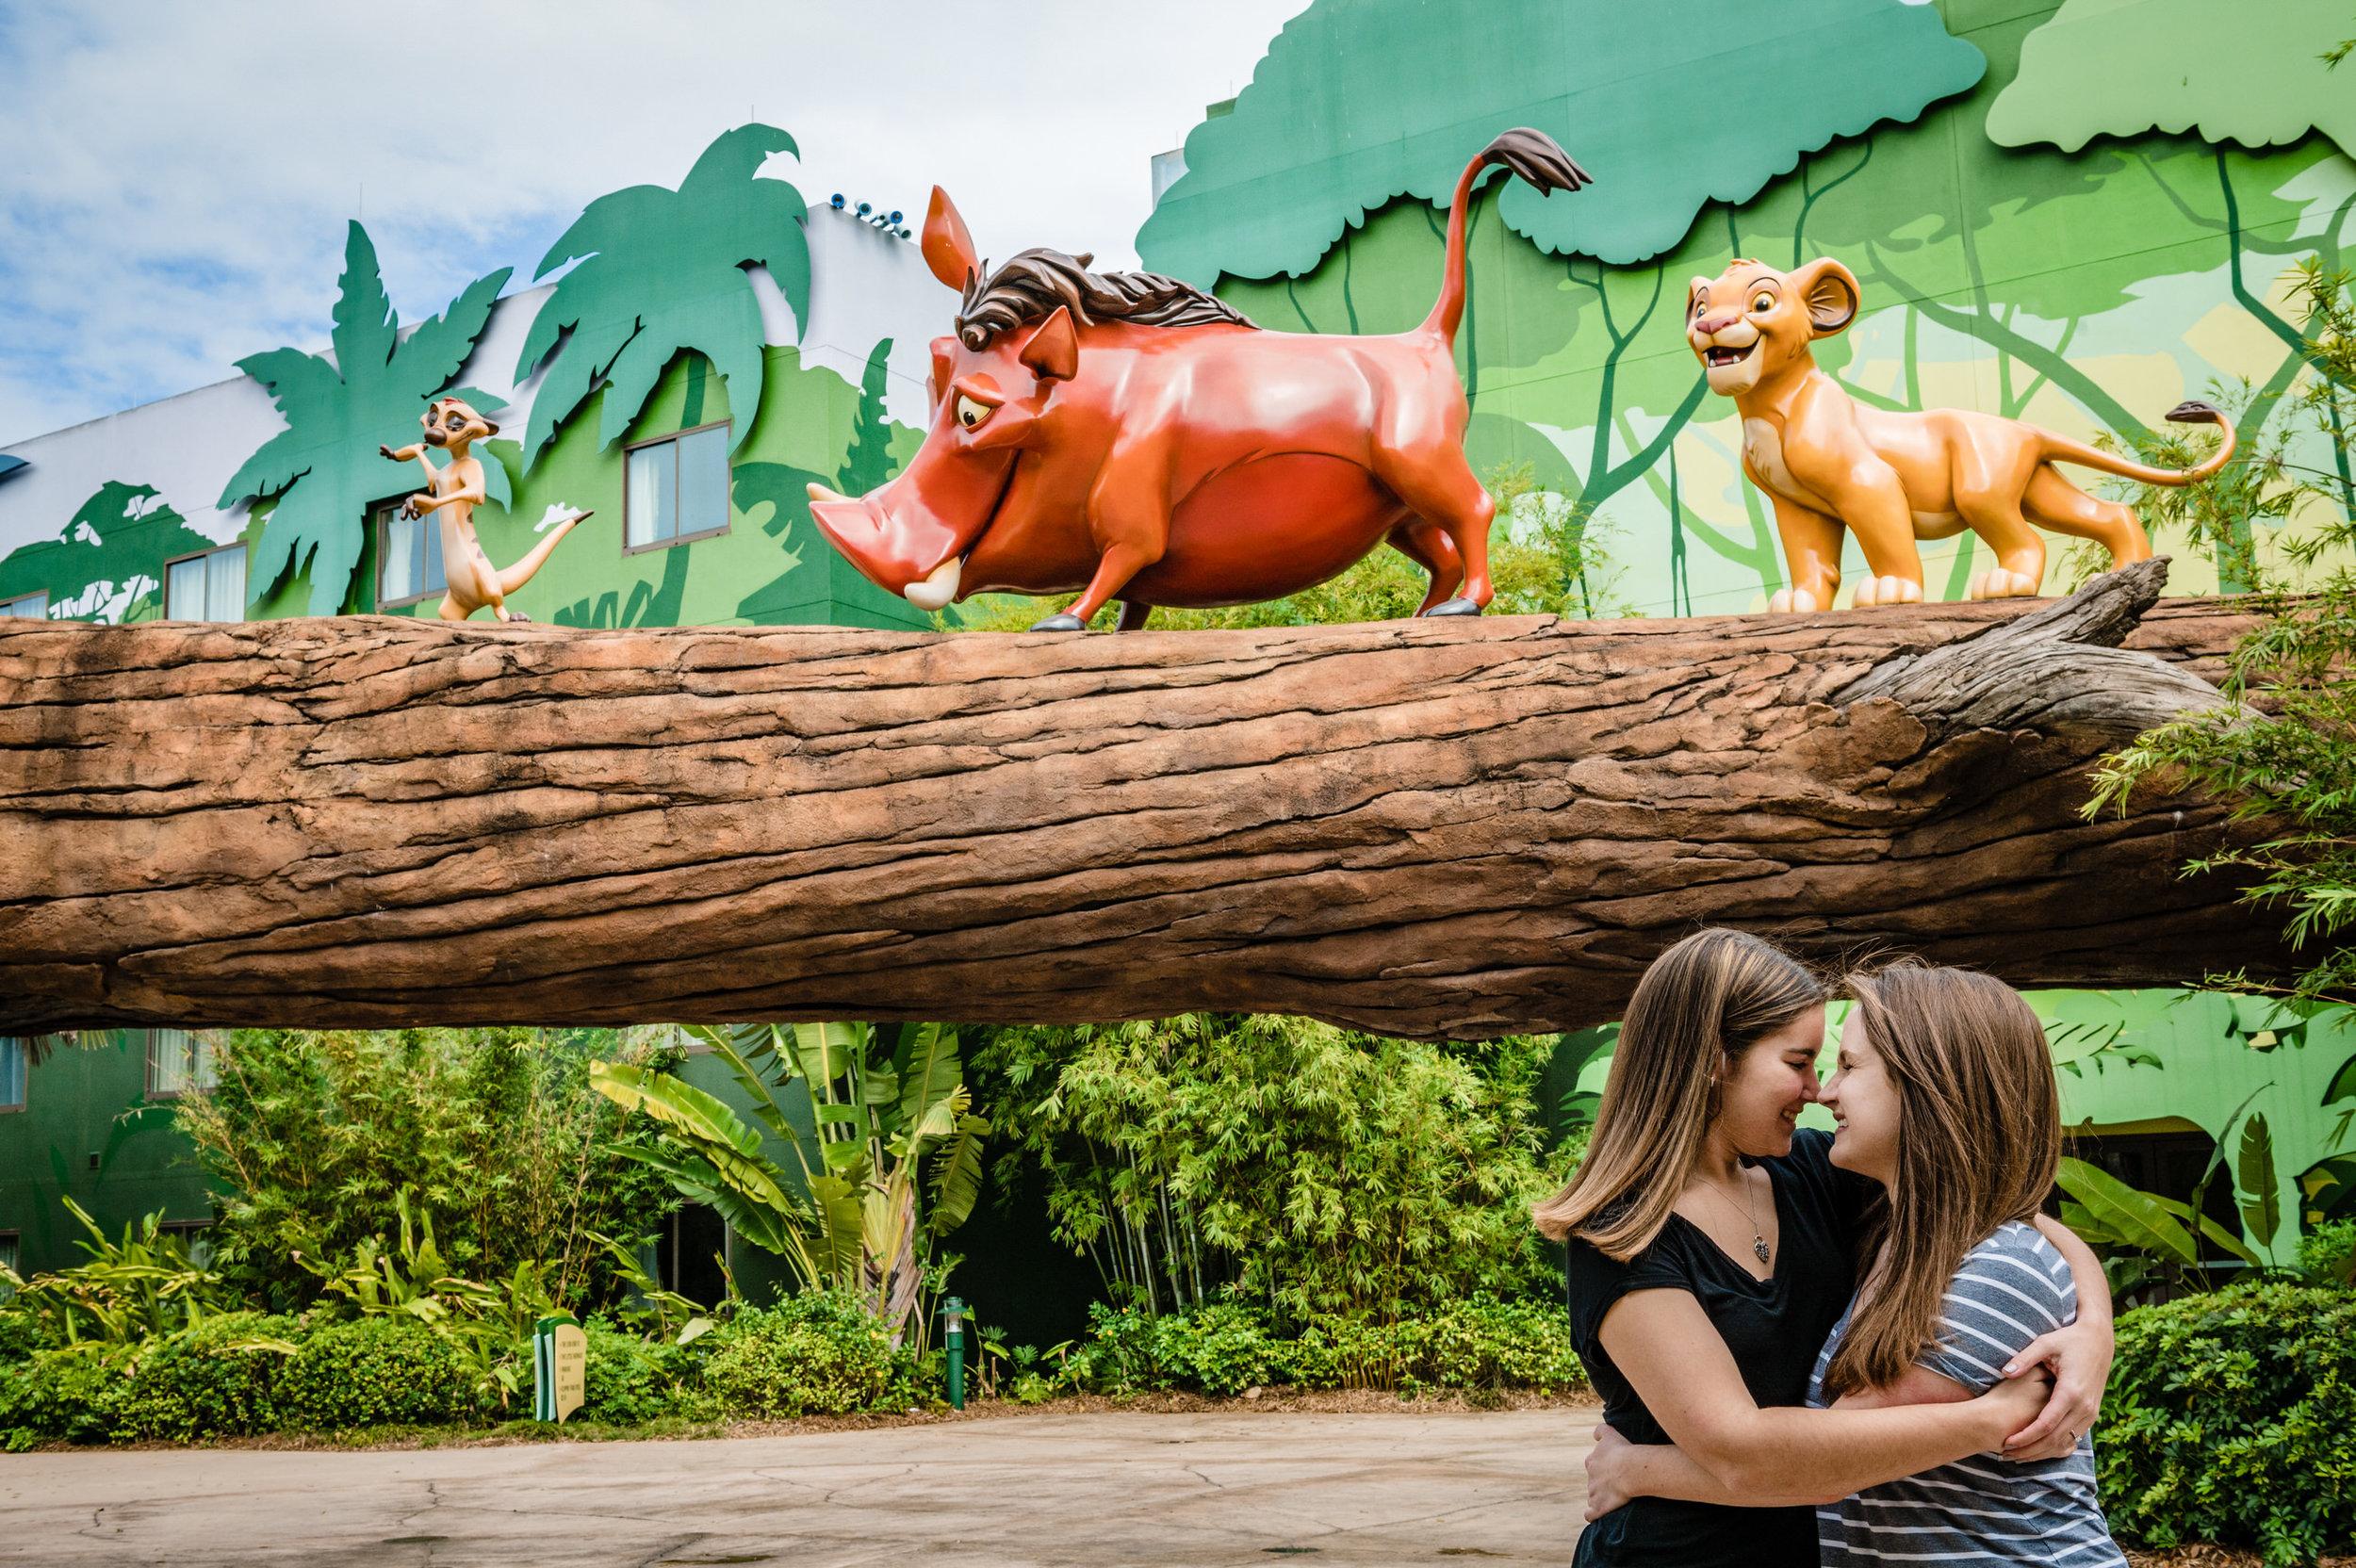 DisneyAnimation-Amanda&Shelby-5284.jpg